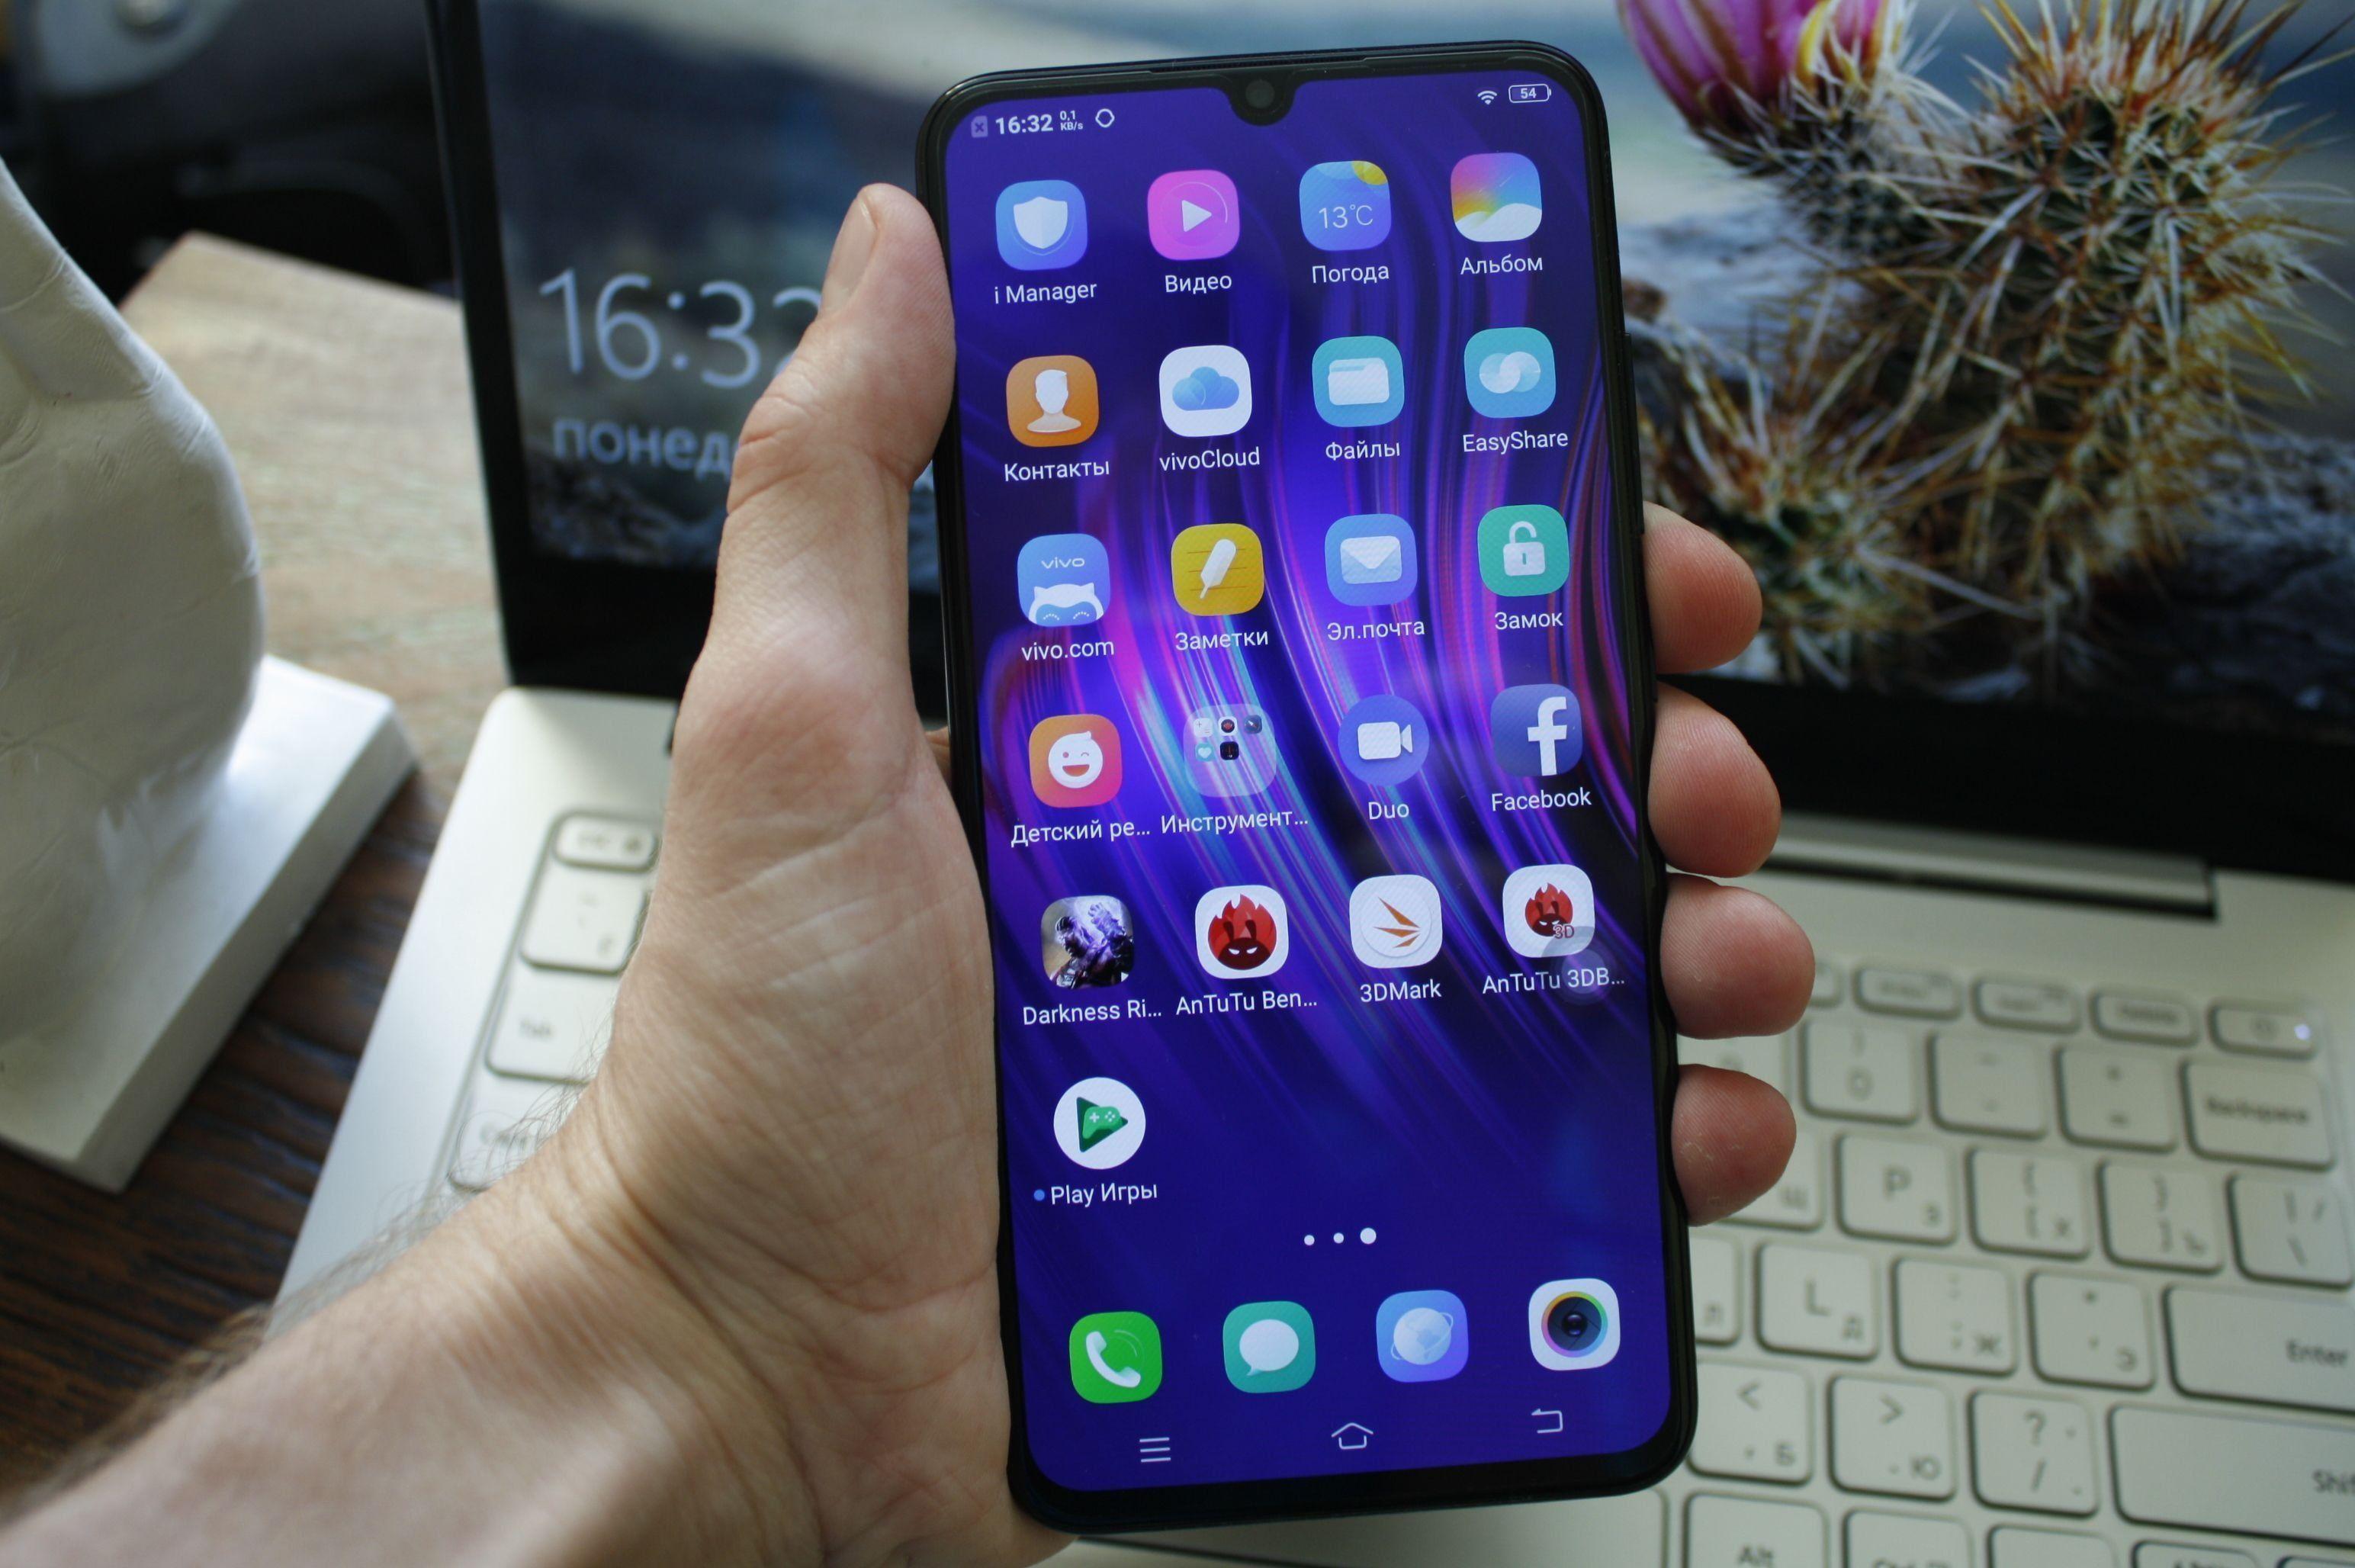 Смартфон Vivo V11 (V11 Pro) - предимства и недостатъци